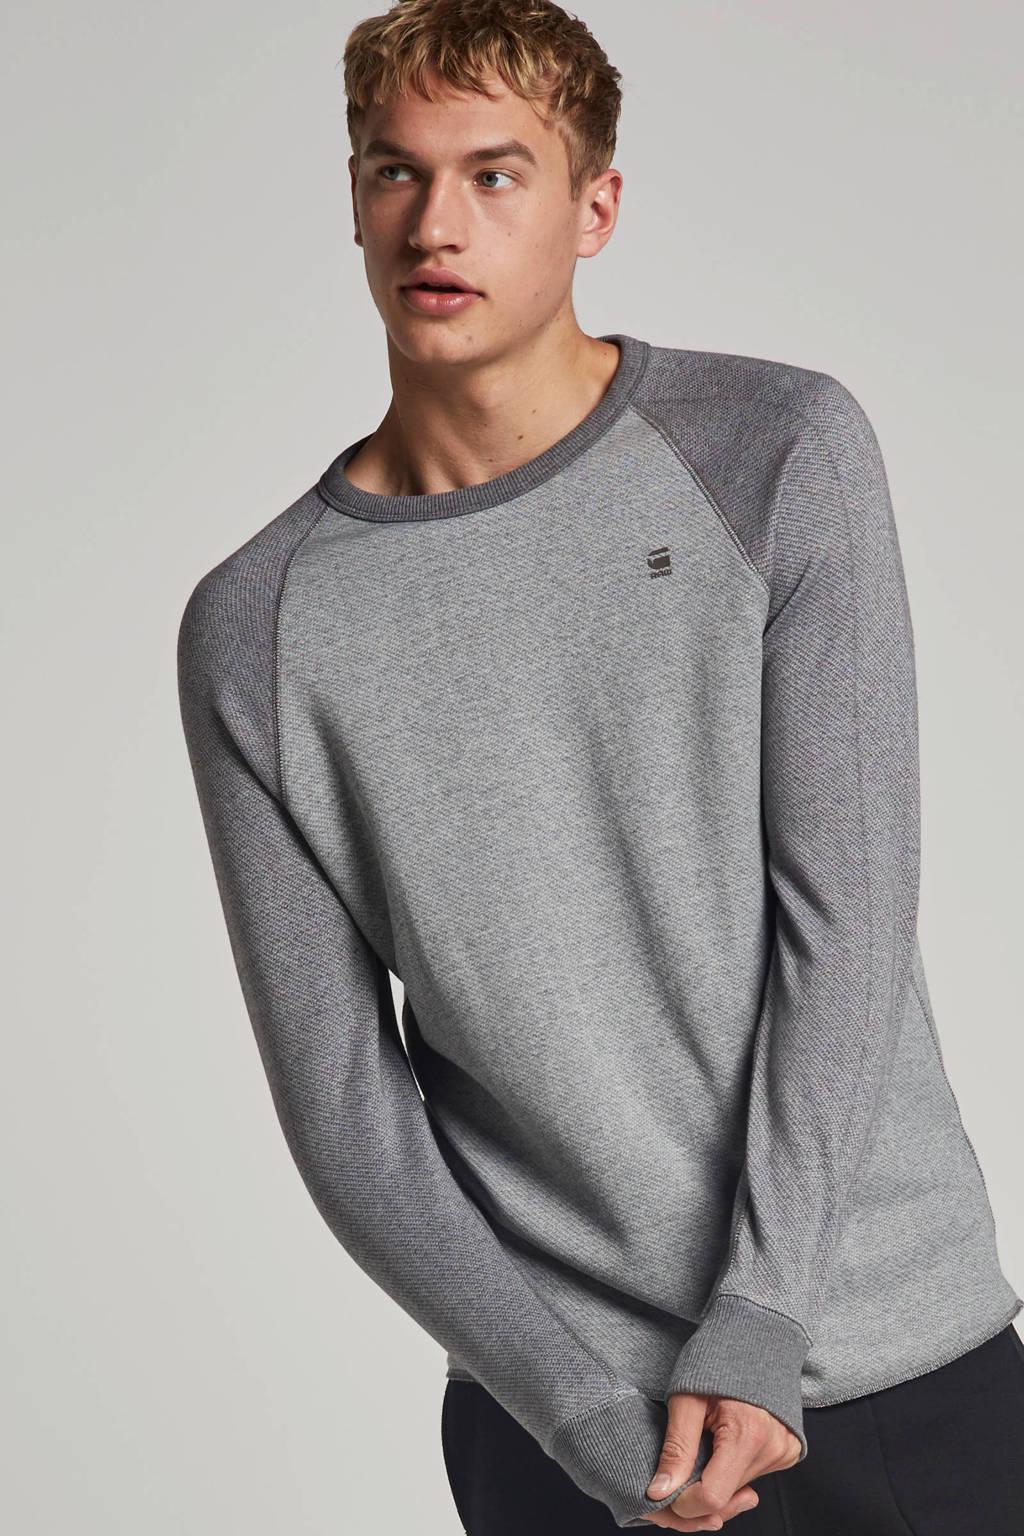 G-Star RAW sweater, Grijs melange